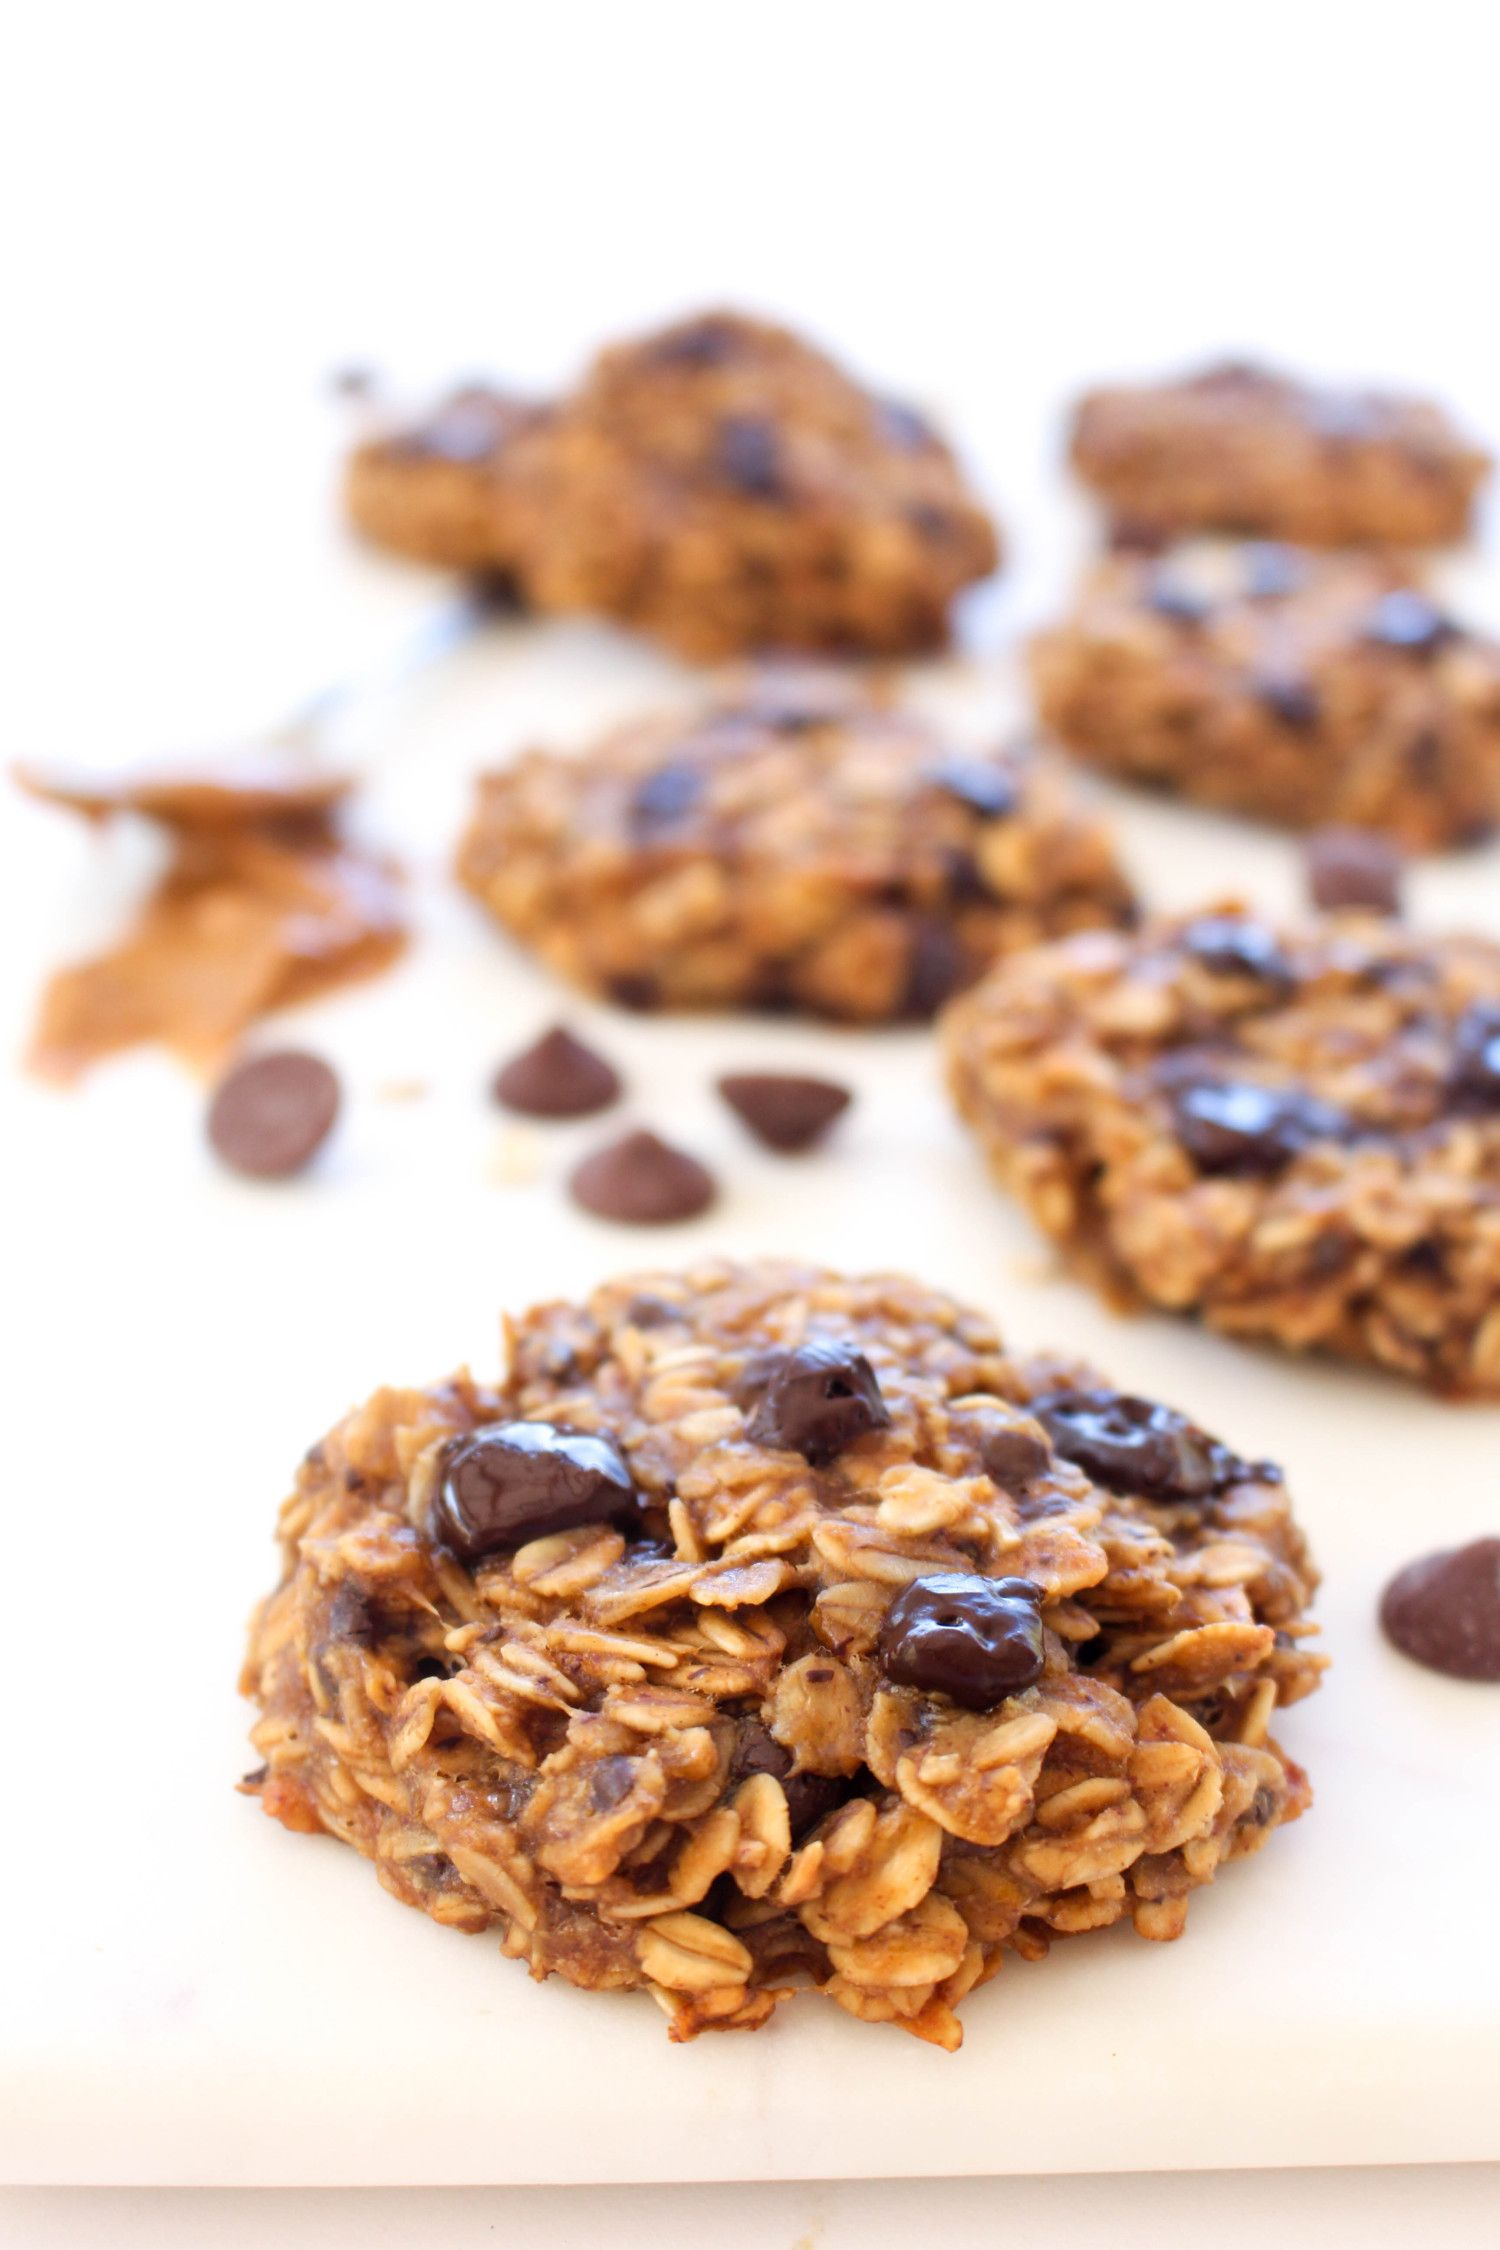 Peanut butter banana breakfast cookies 20 minutes bake